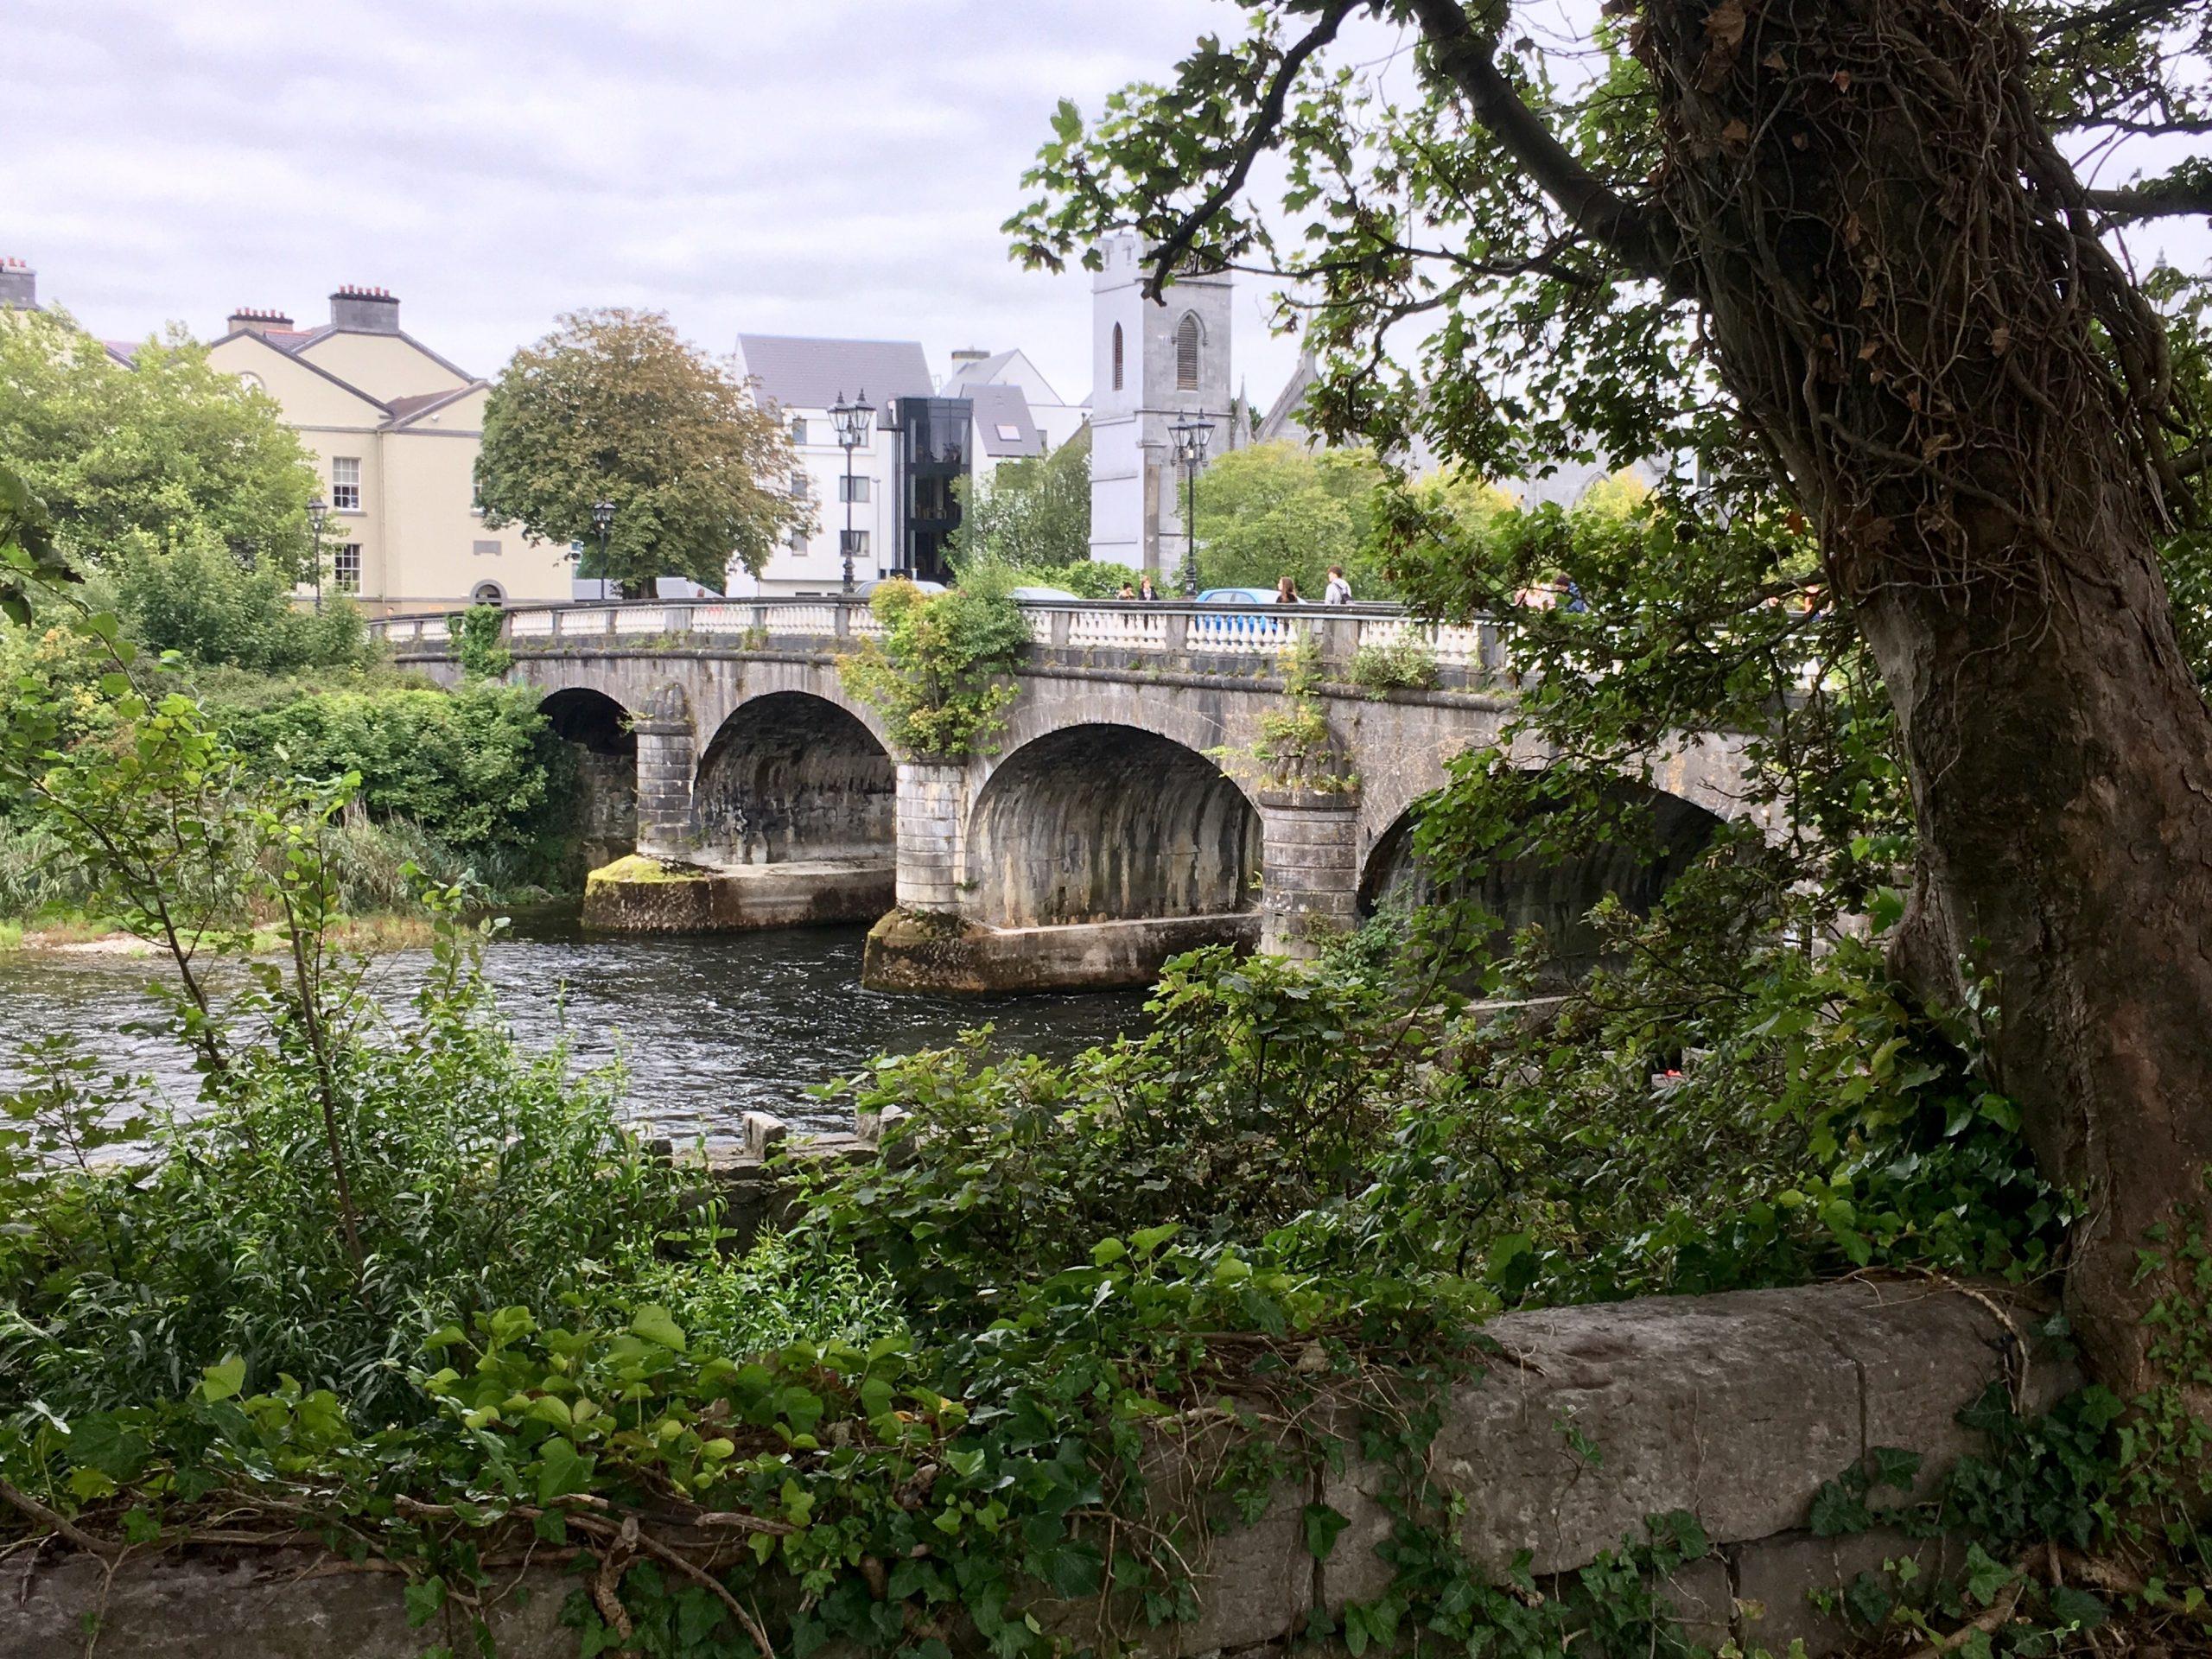 Salmon Weir Bridge in Galway City - Visit Galway